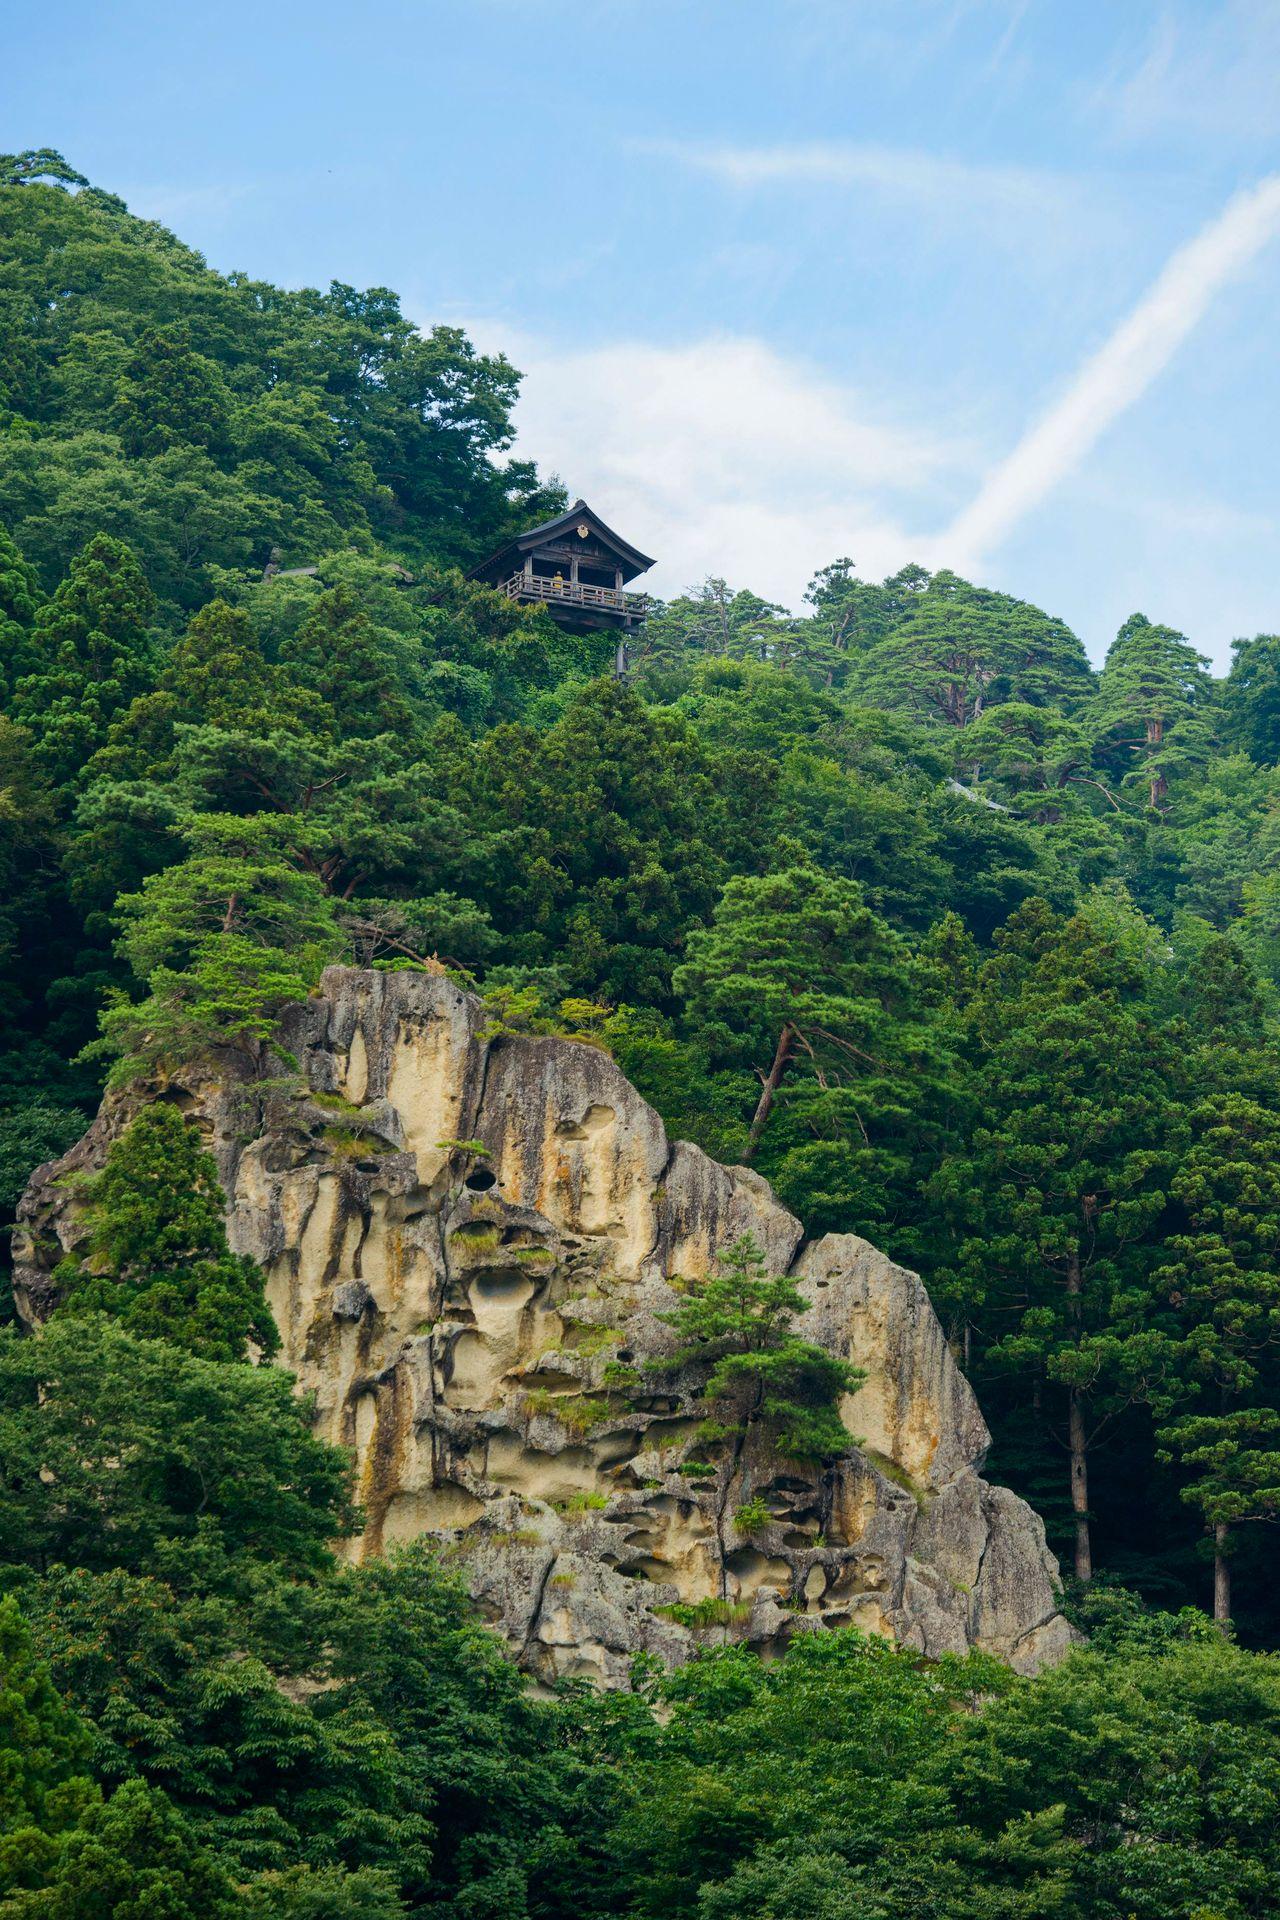 断崖に建つ「胎内堂」。一般参拝者は立ち入り禁止 写真提供:山形県観光物産協会